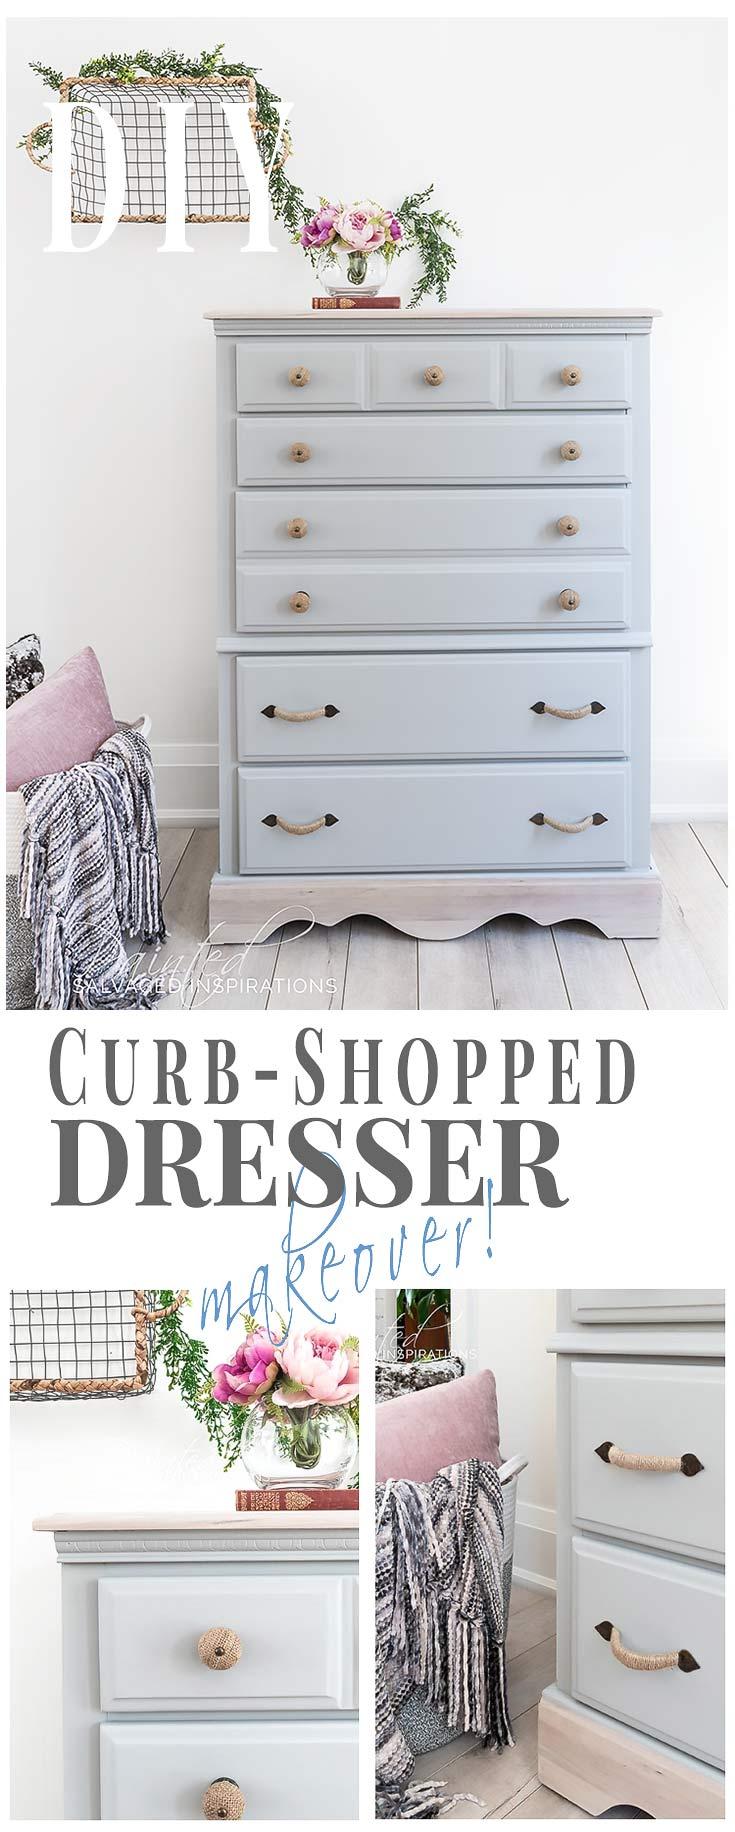 DIY CurbShopped Dresser Makeover_